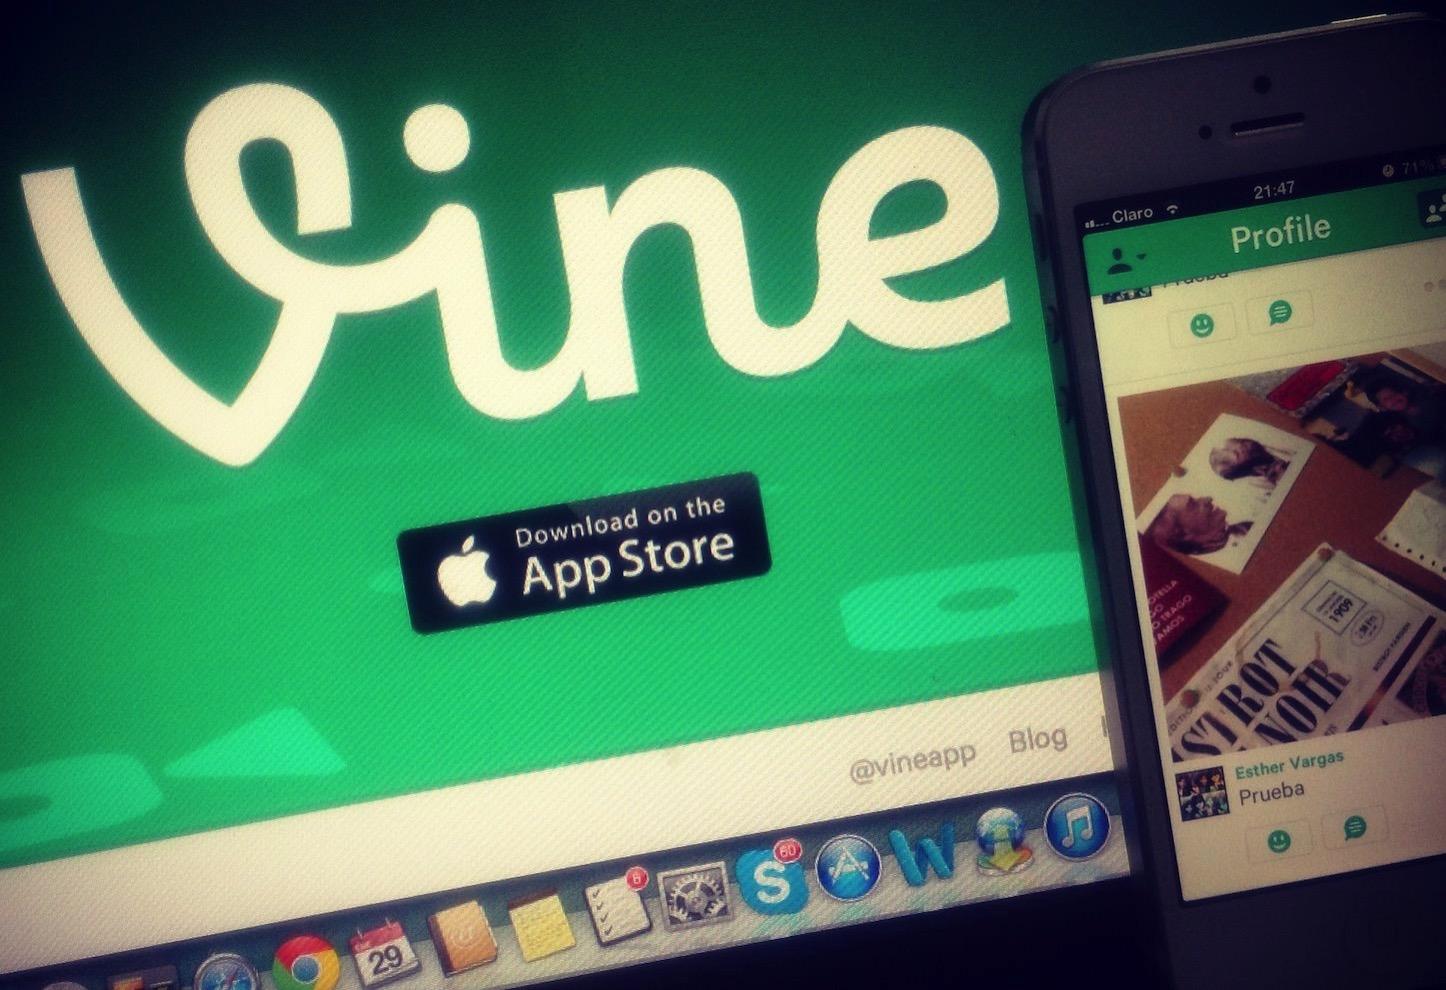 Vine web and phone